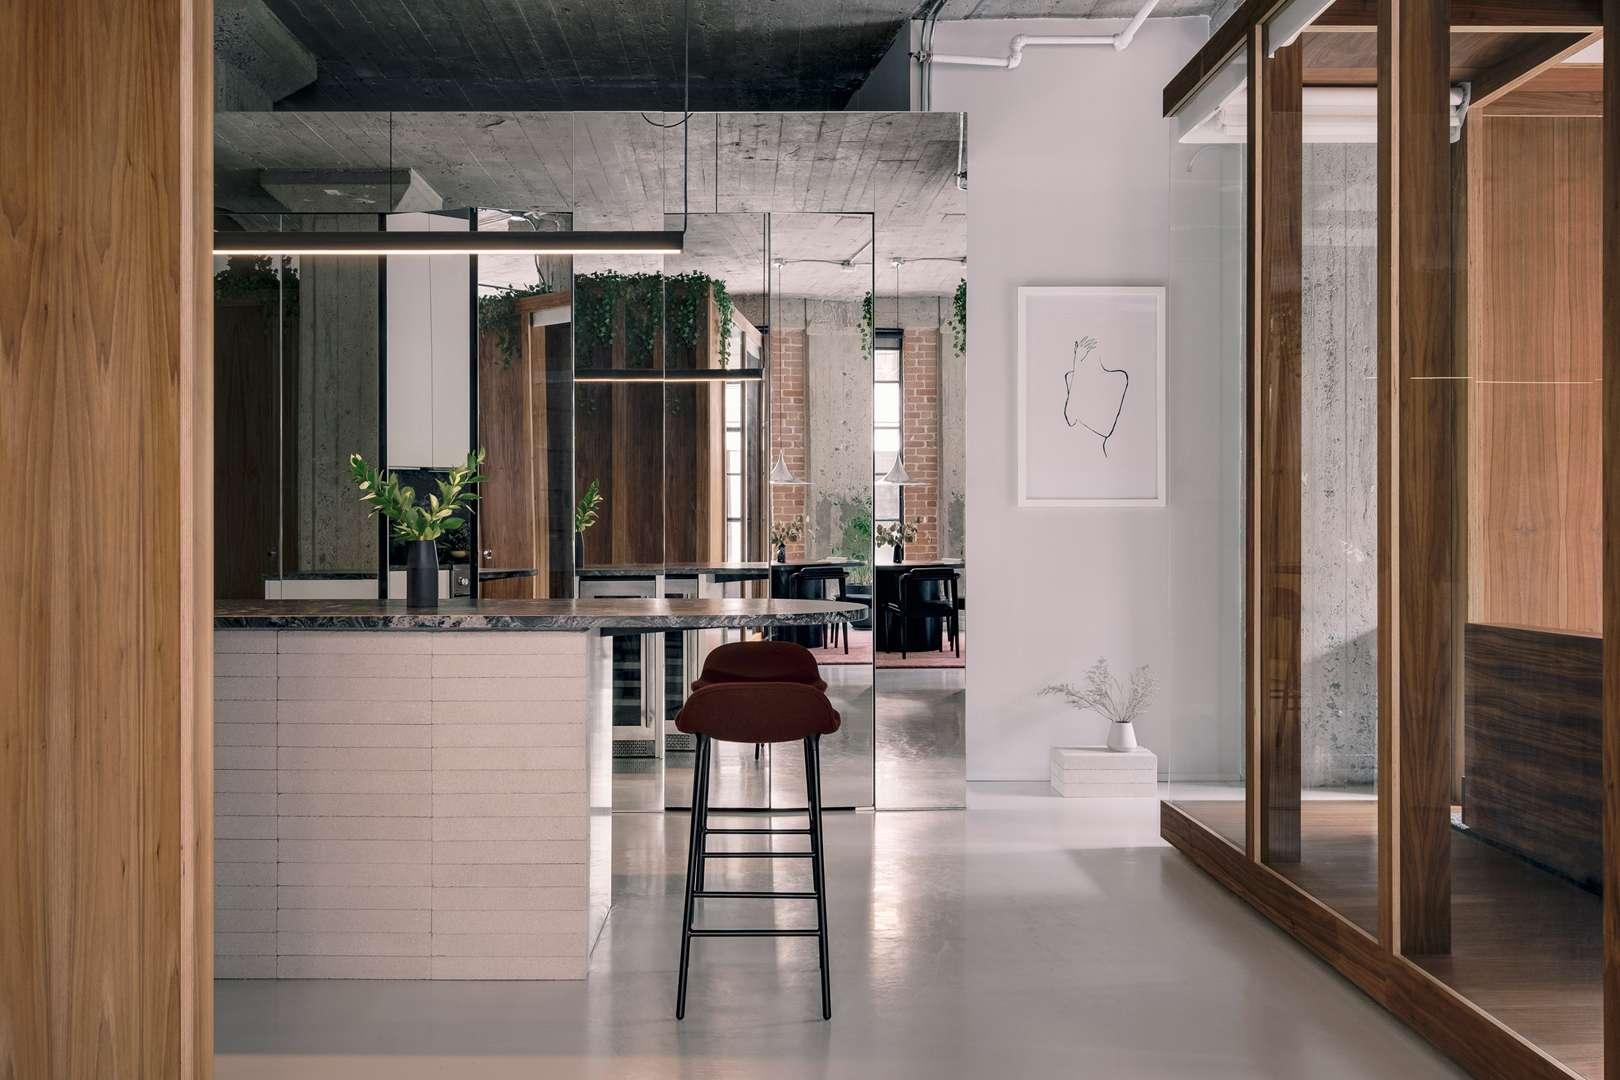 montreal-loft-renovation-by-future-simple-studio-interiors-canada_dezeen_2364_col_9